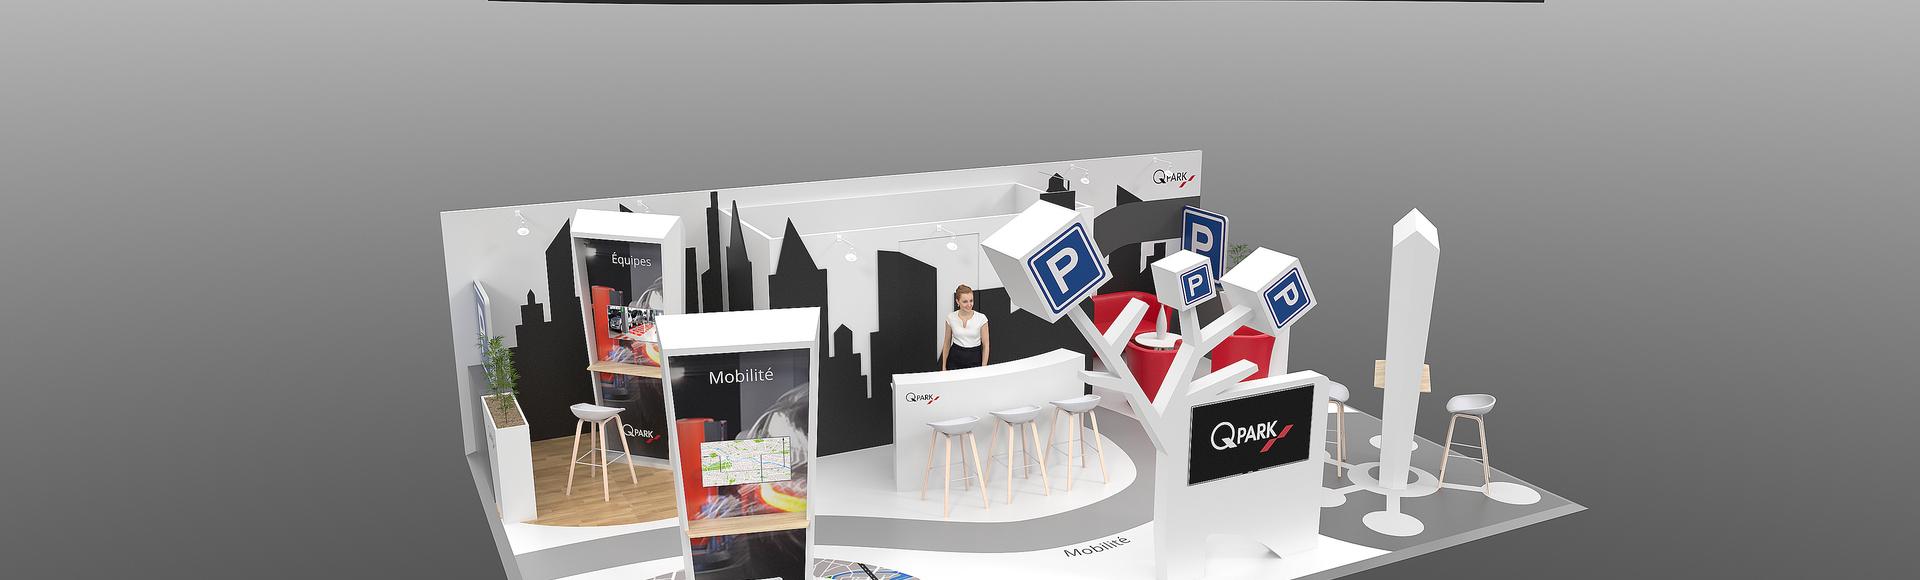 designer freelance stand évènementiel Qpark